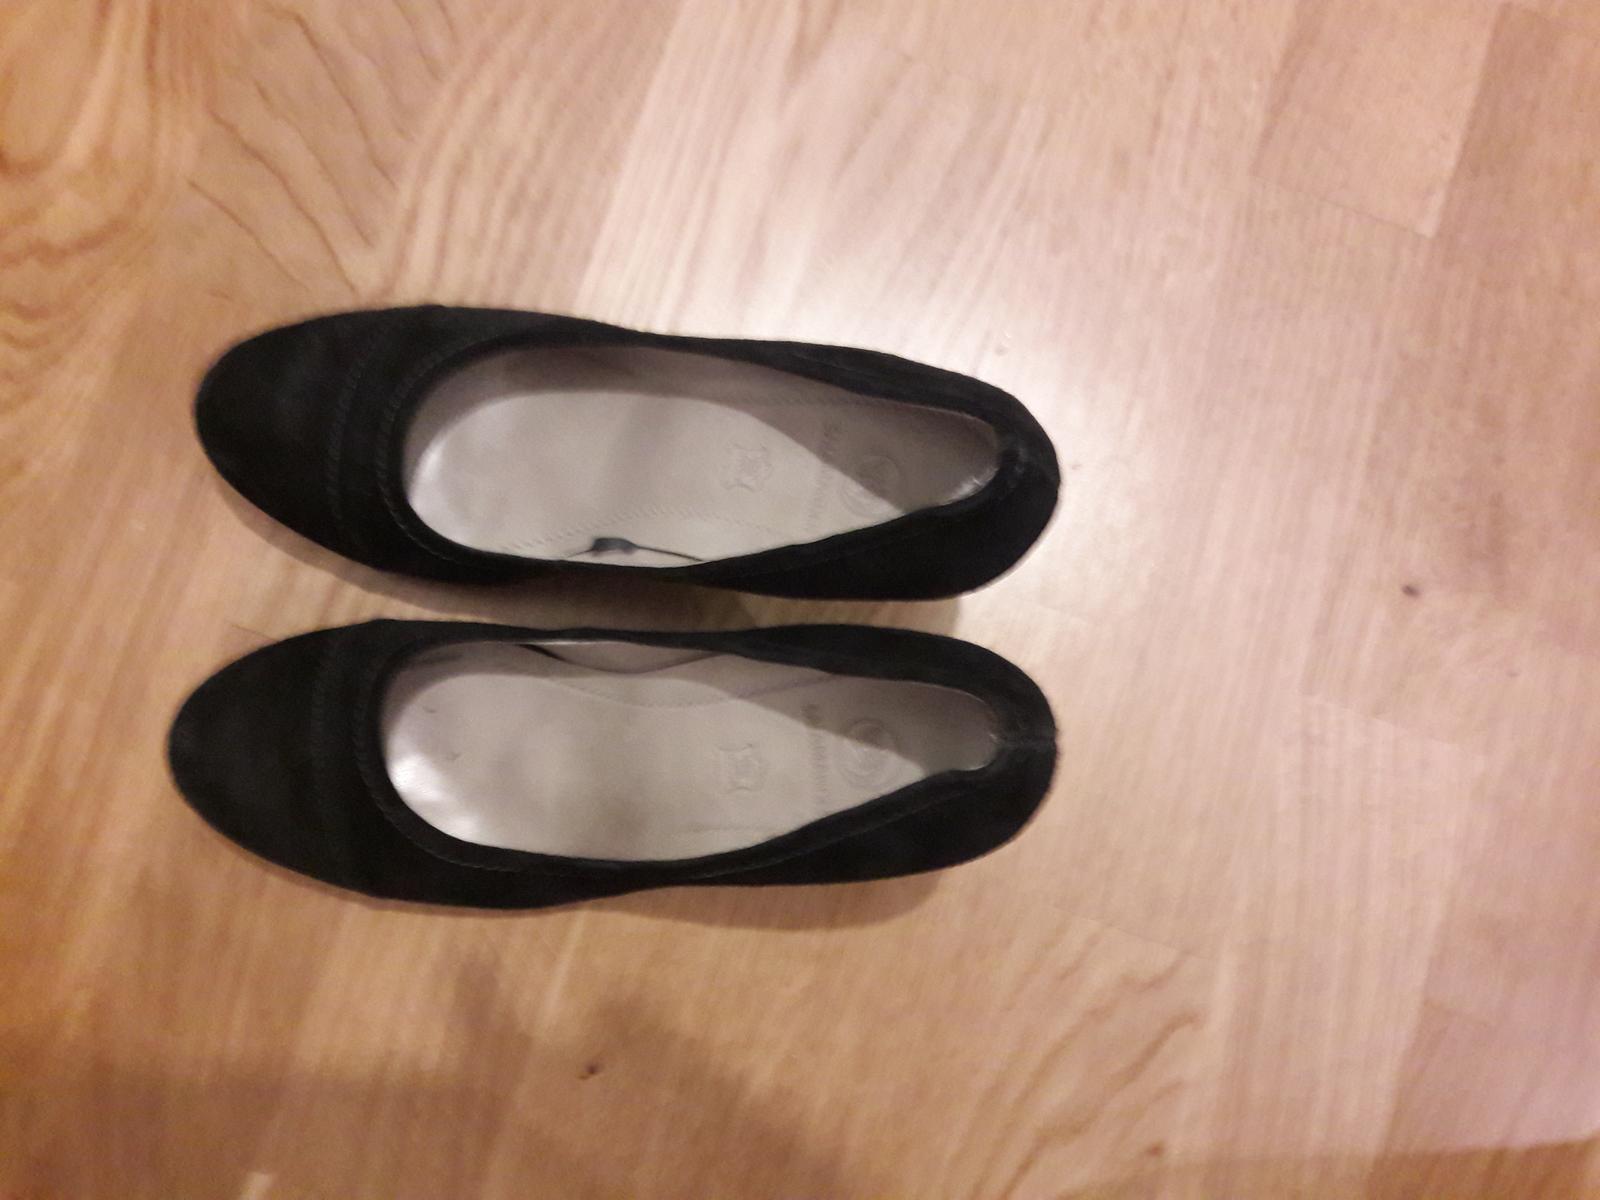 f1d39433fd2a Čierne kožené topánky zn. salamander